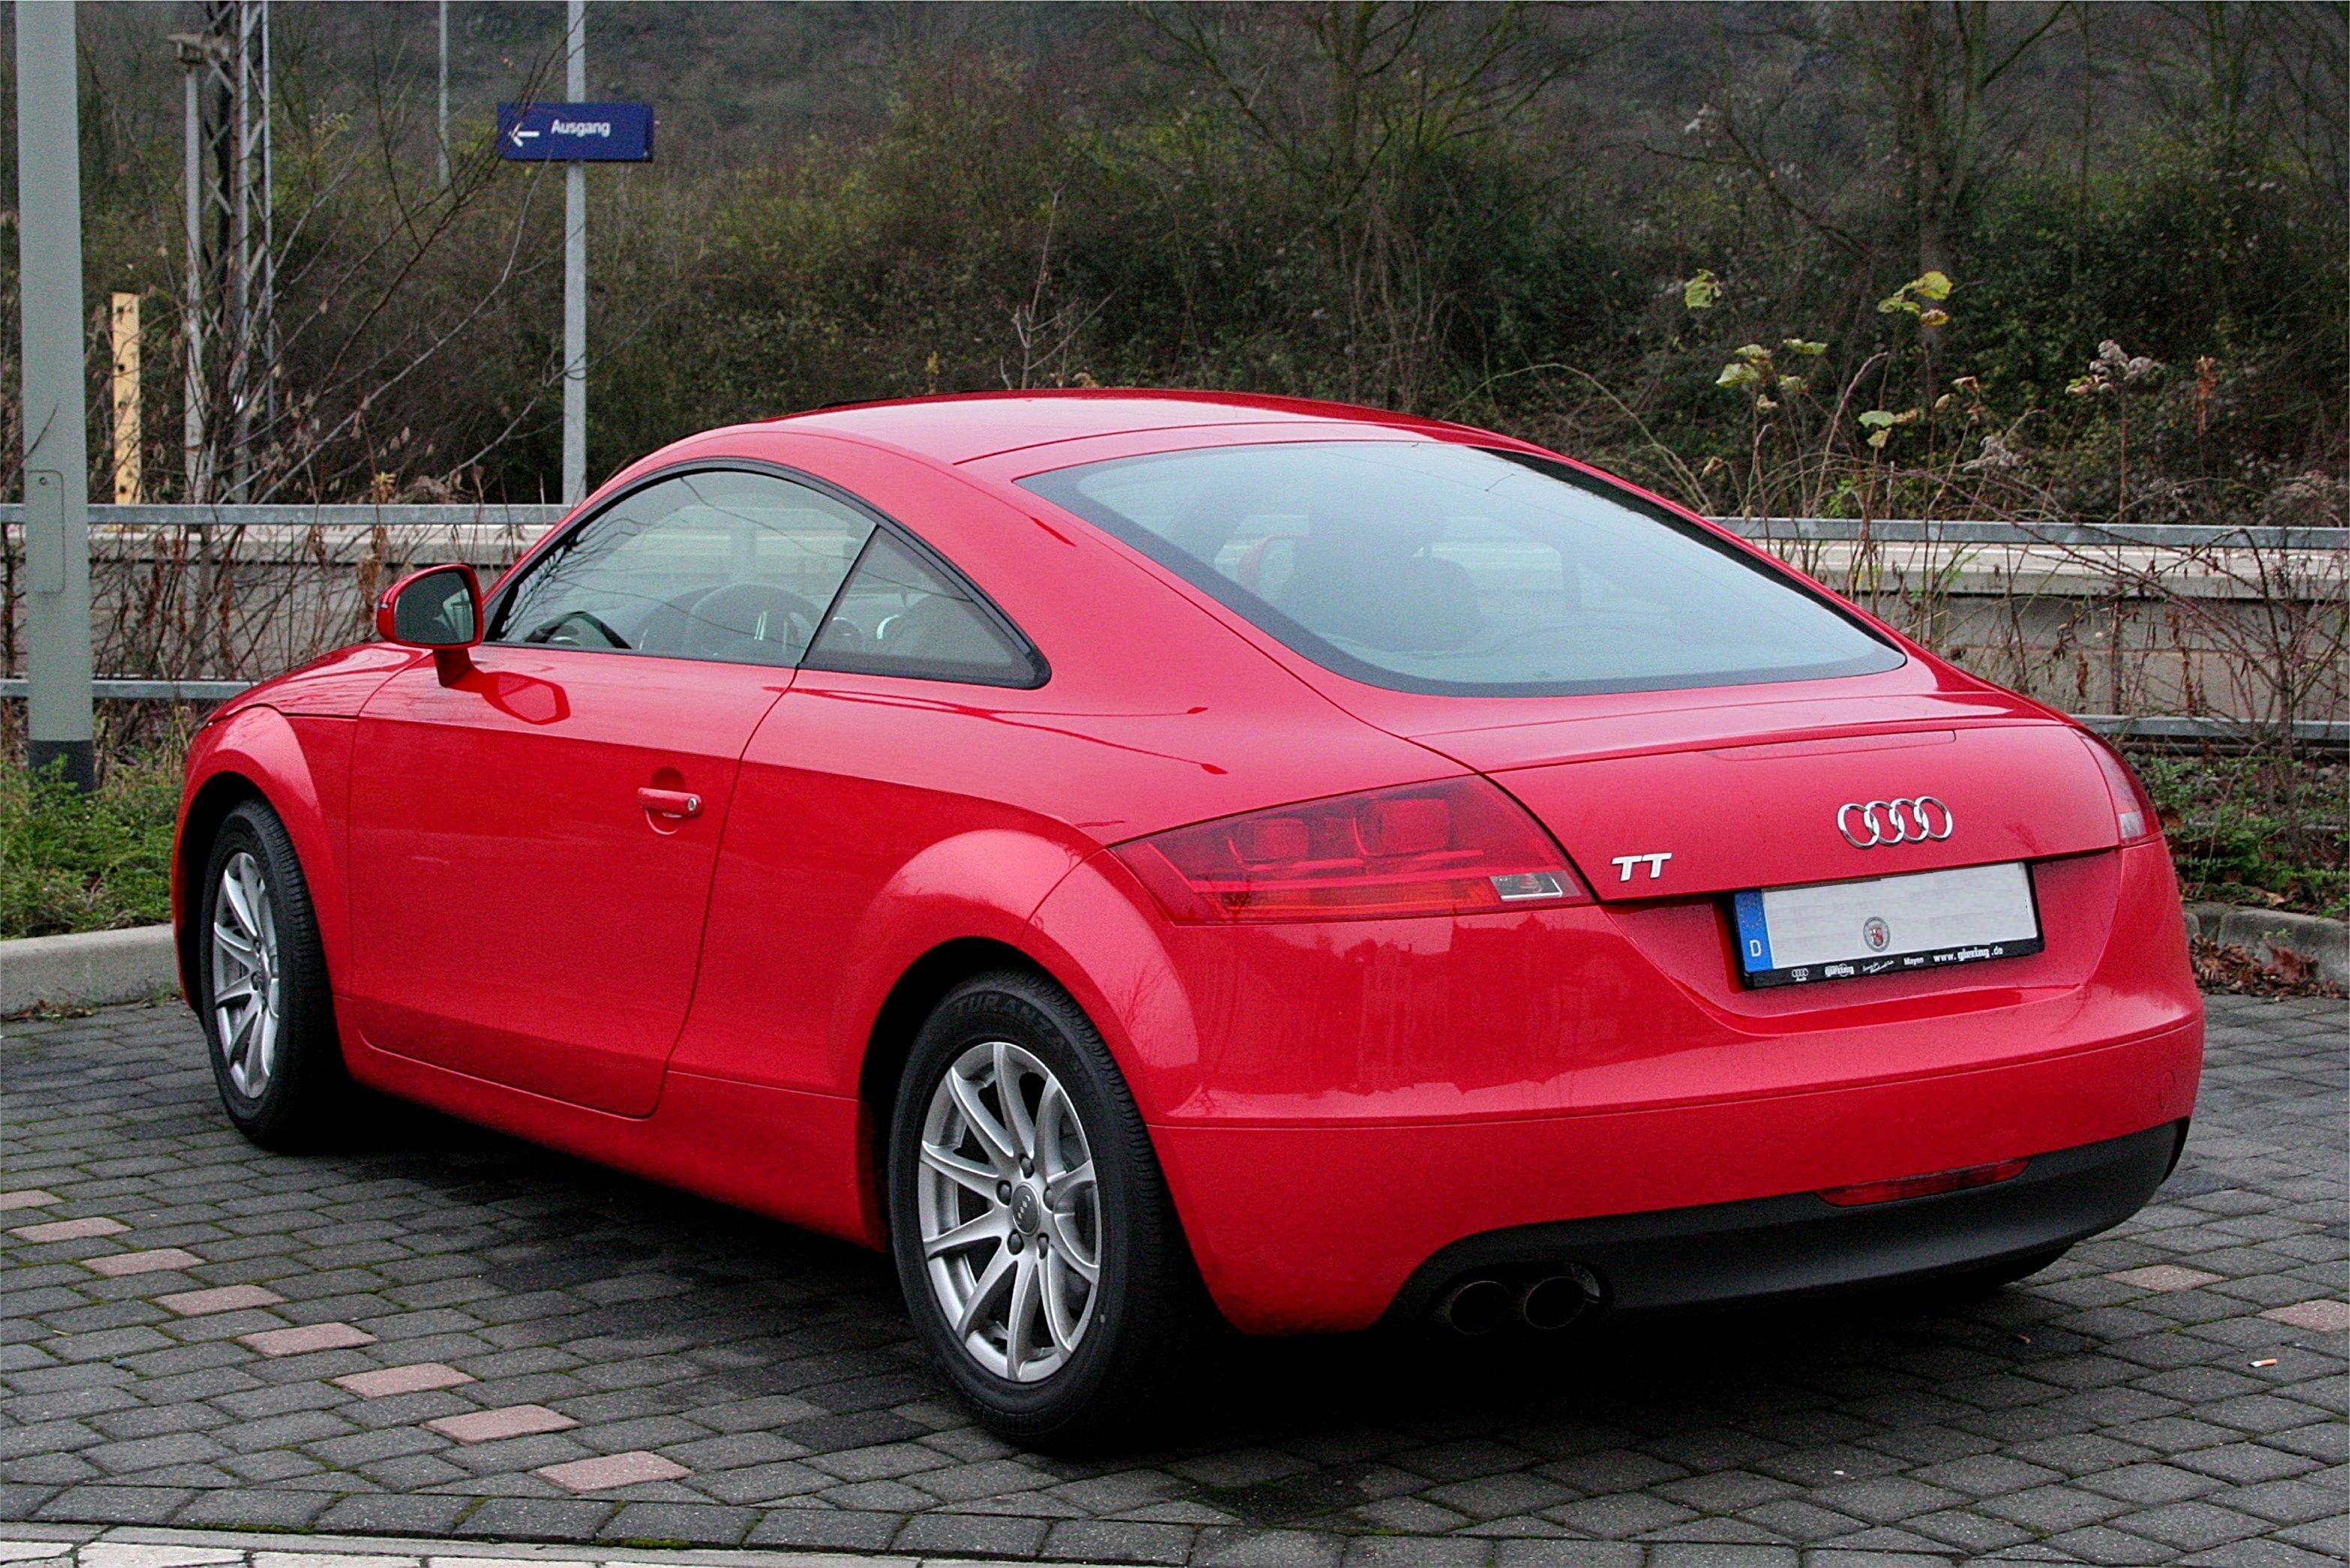 2006 Audi Tt Image 25